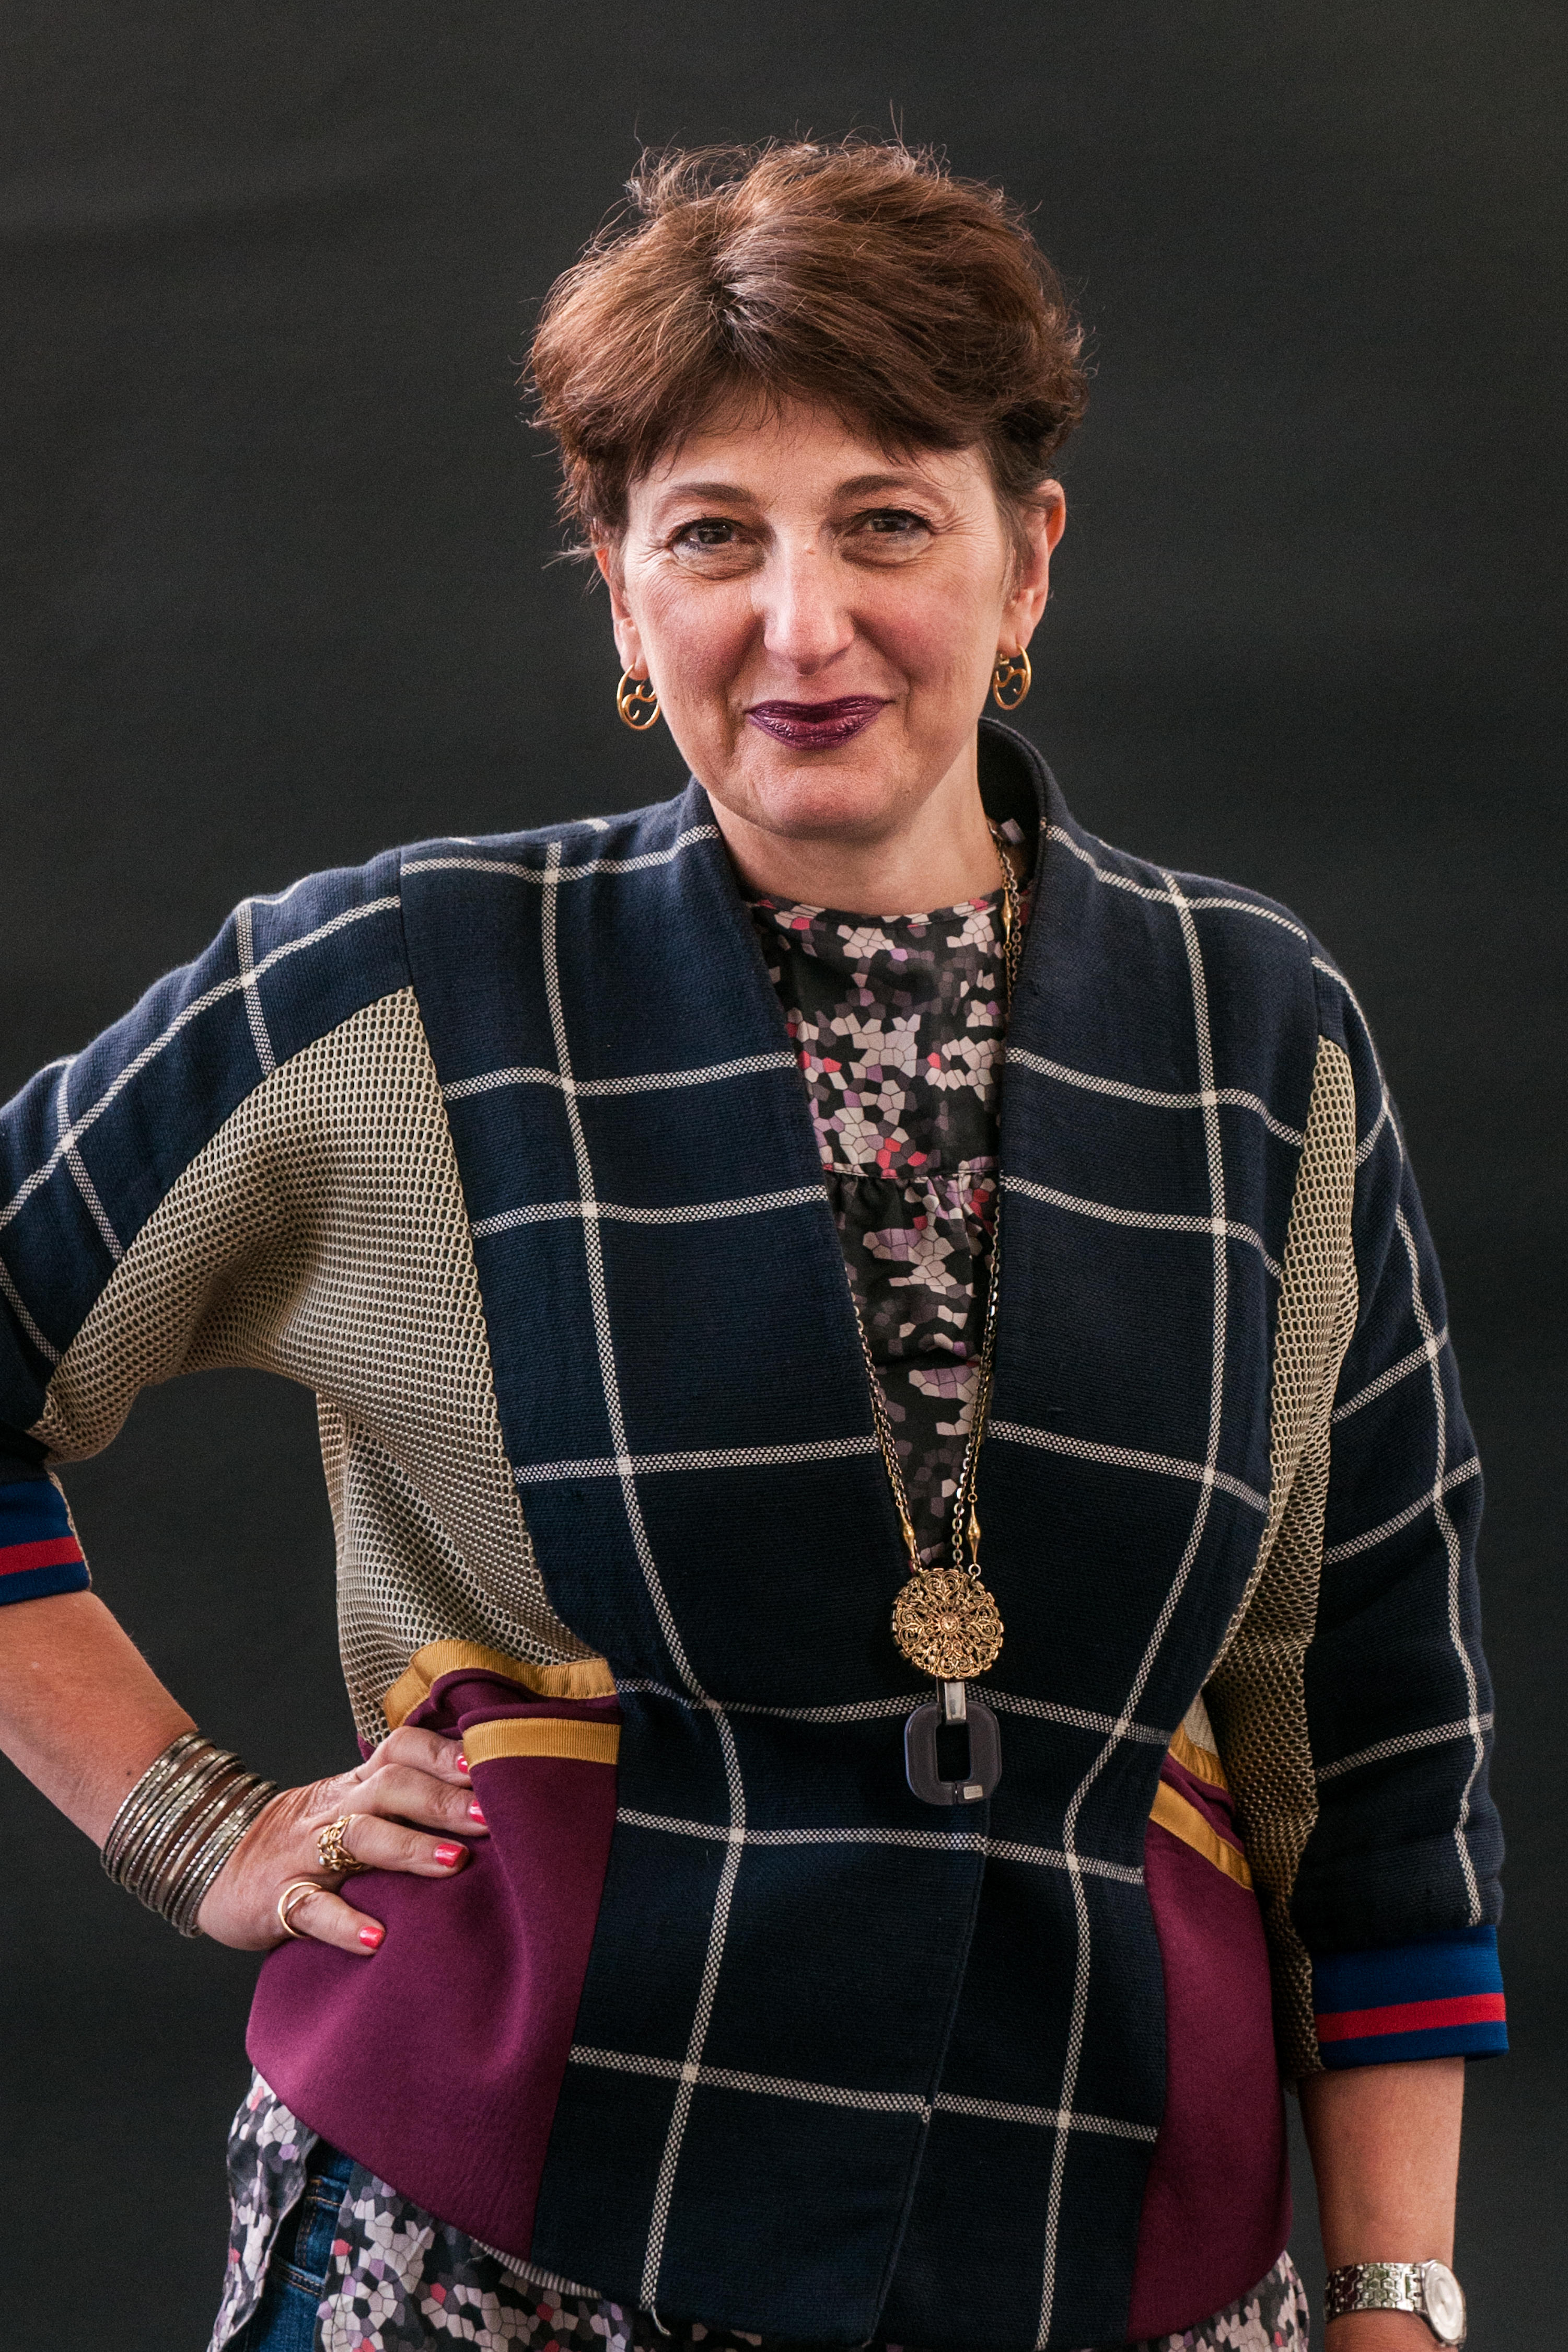 Julia Hobsbawn